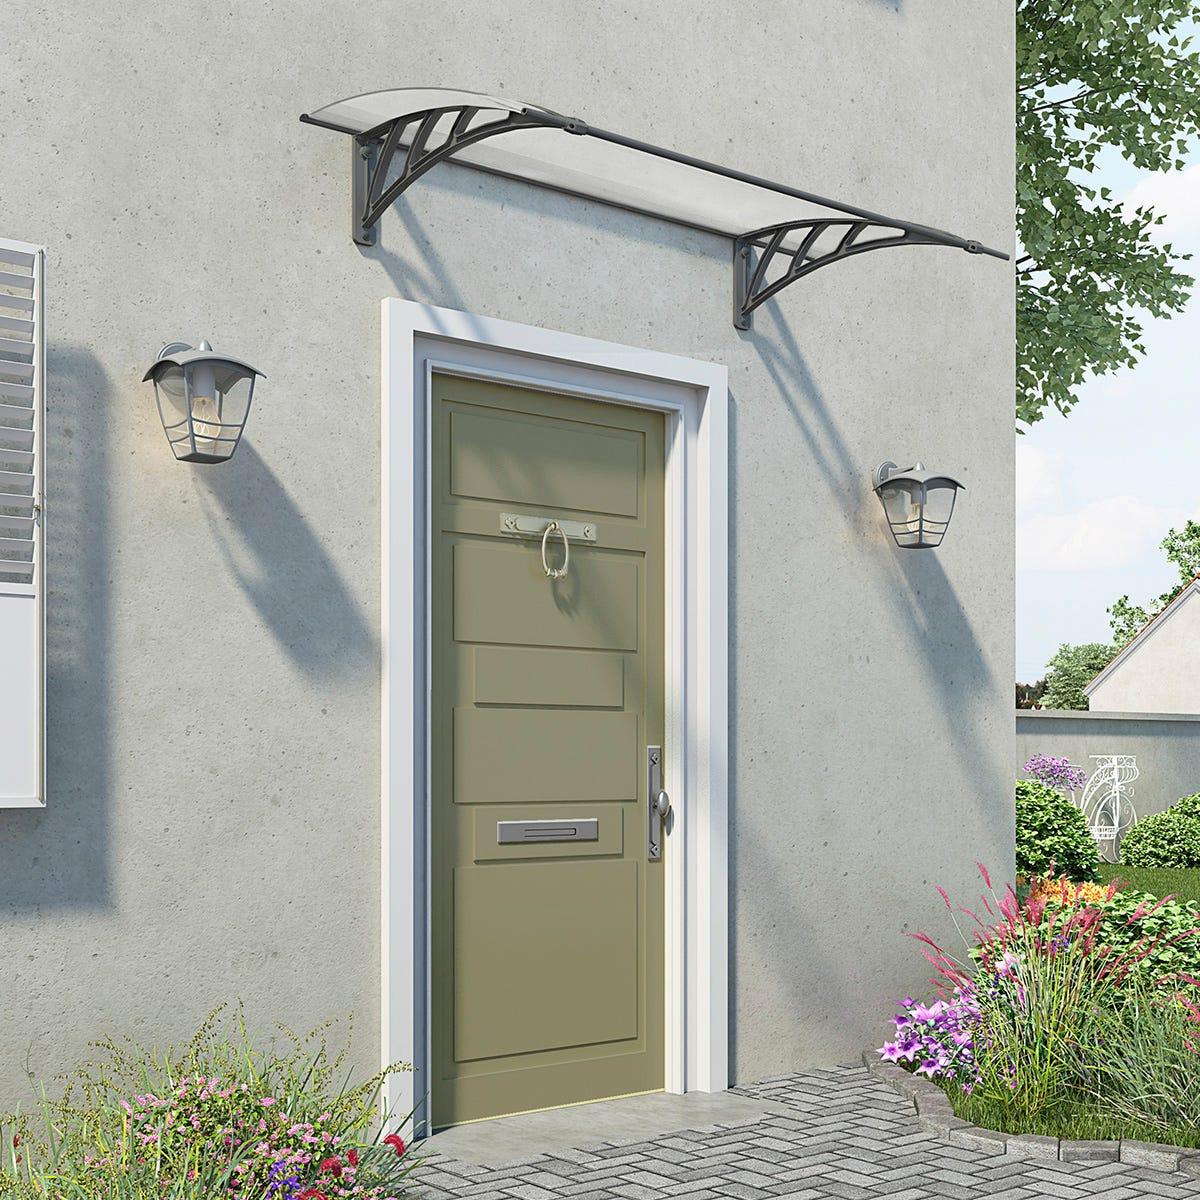 Palram - Canopia Twinwall Canopy Neo 1350 - Grey